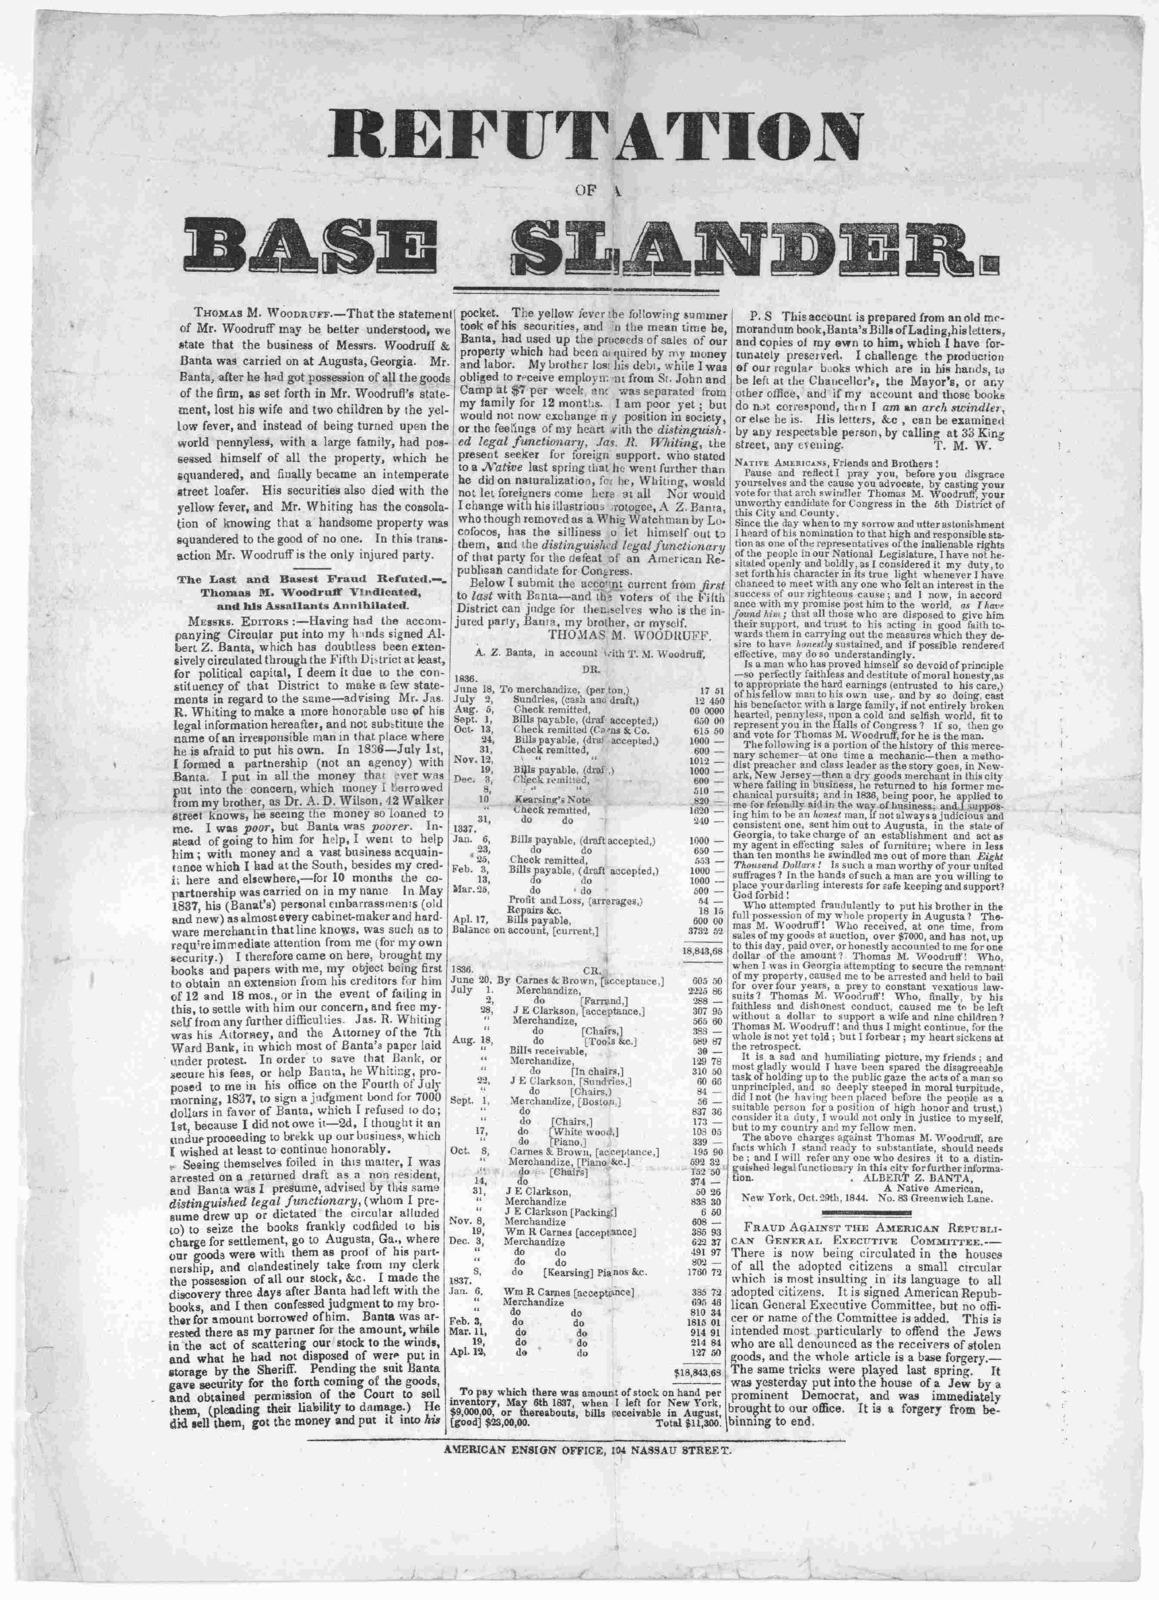 Refutation of a base slander [Regarding Thomas M. Woodruff] American Ensign Office, 104 Nassau Street. [1844].